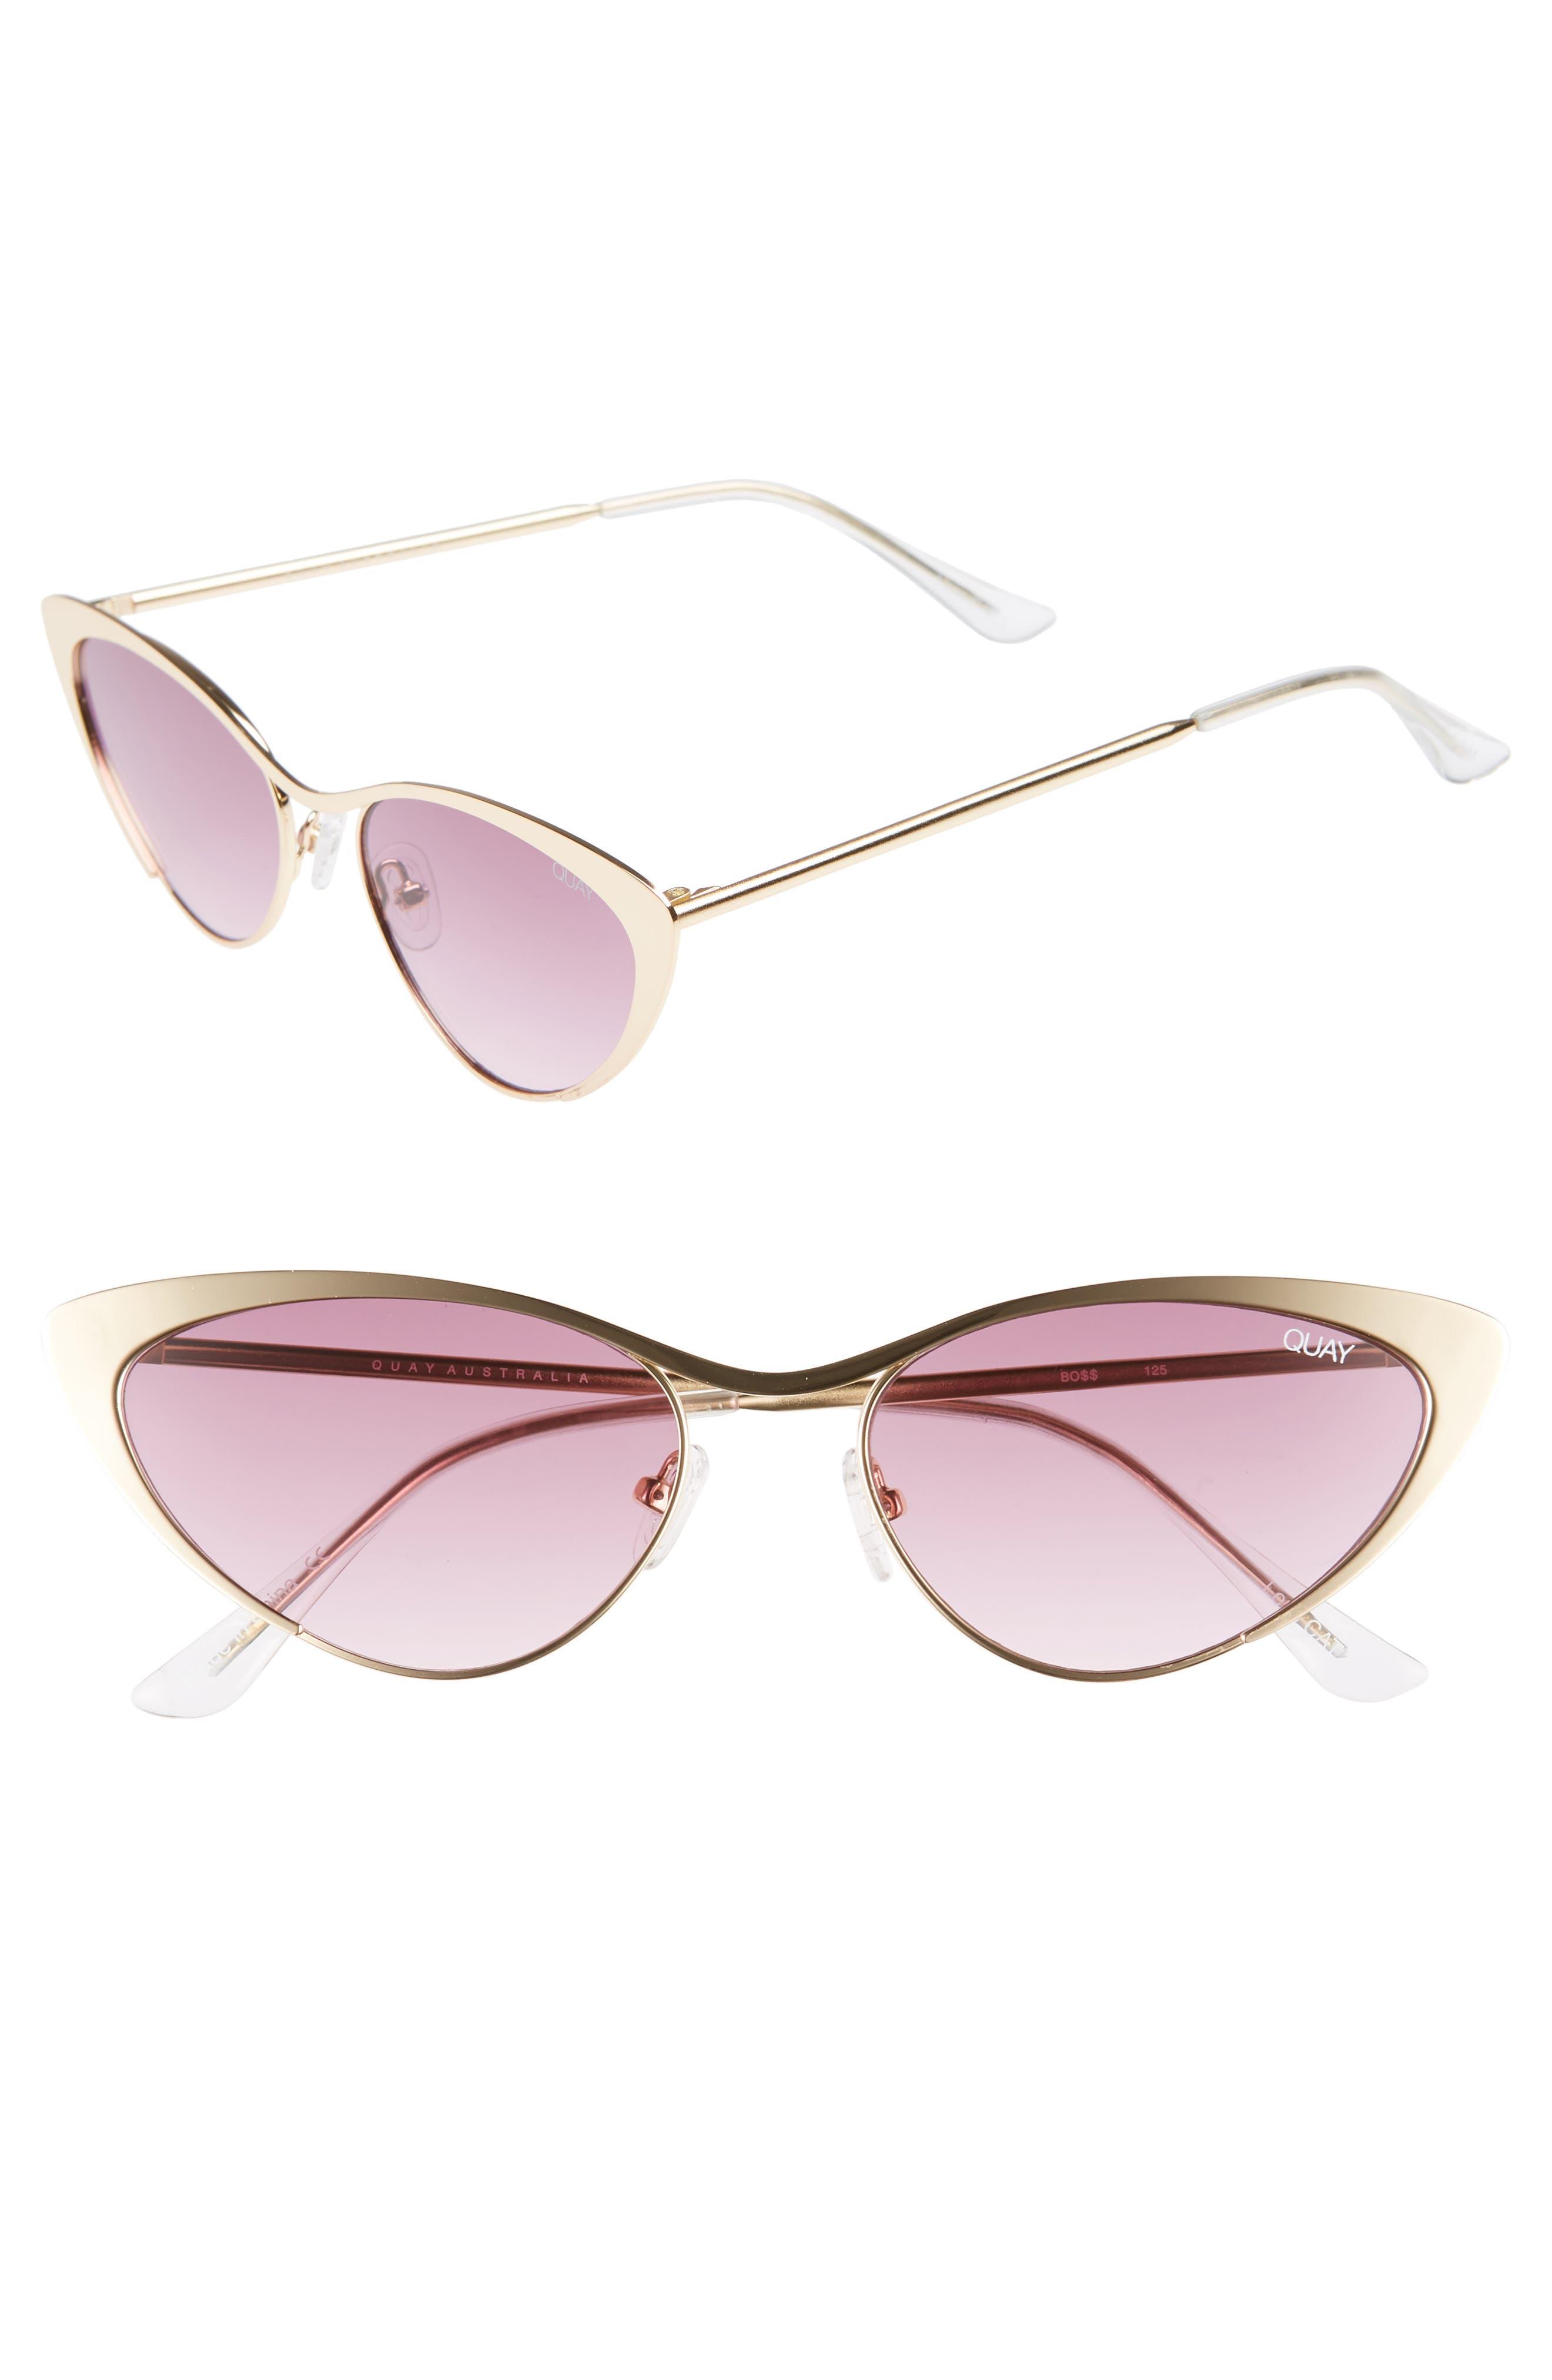 Quay Australia Boss 5m Cat Eye Sunglasses - Gold/ Purple